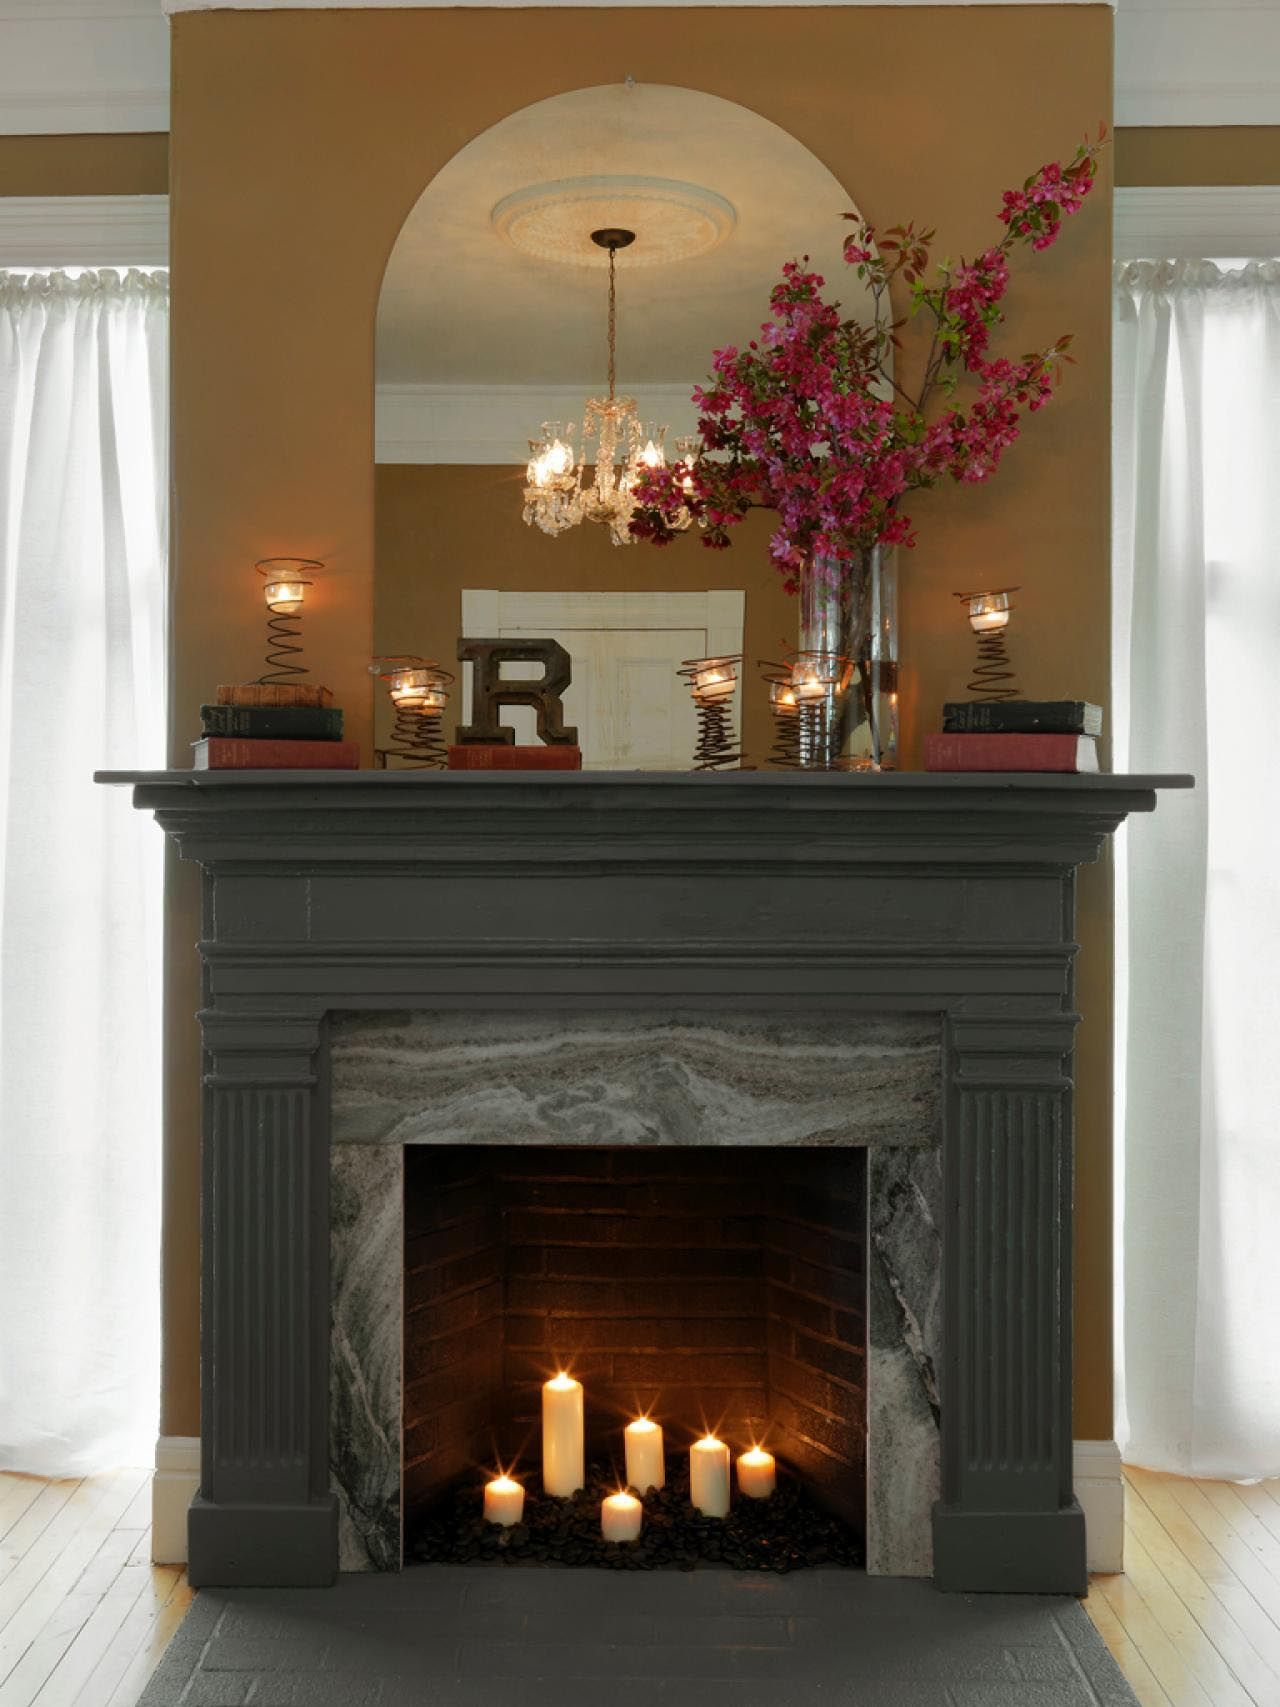 DIY Fireplace Mantel and Surround Diy fireplace